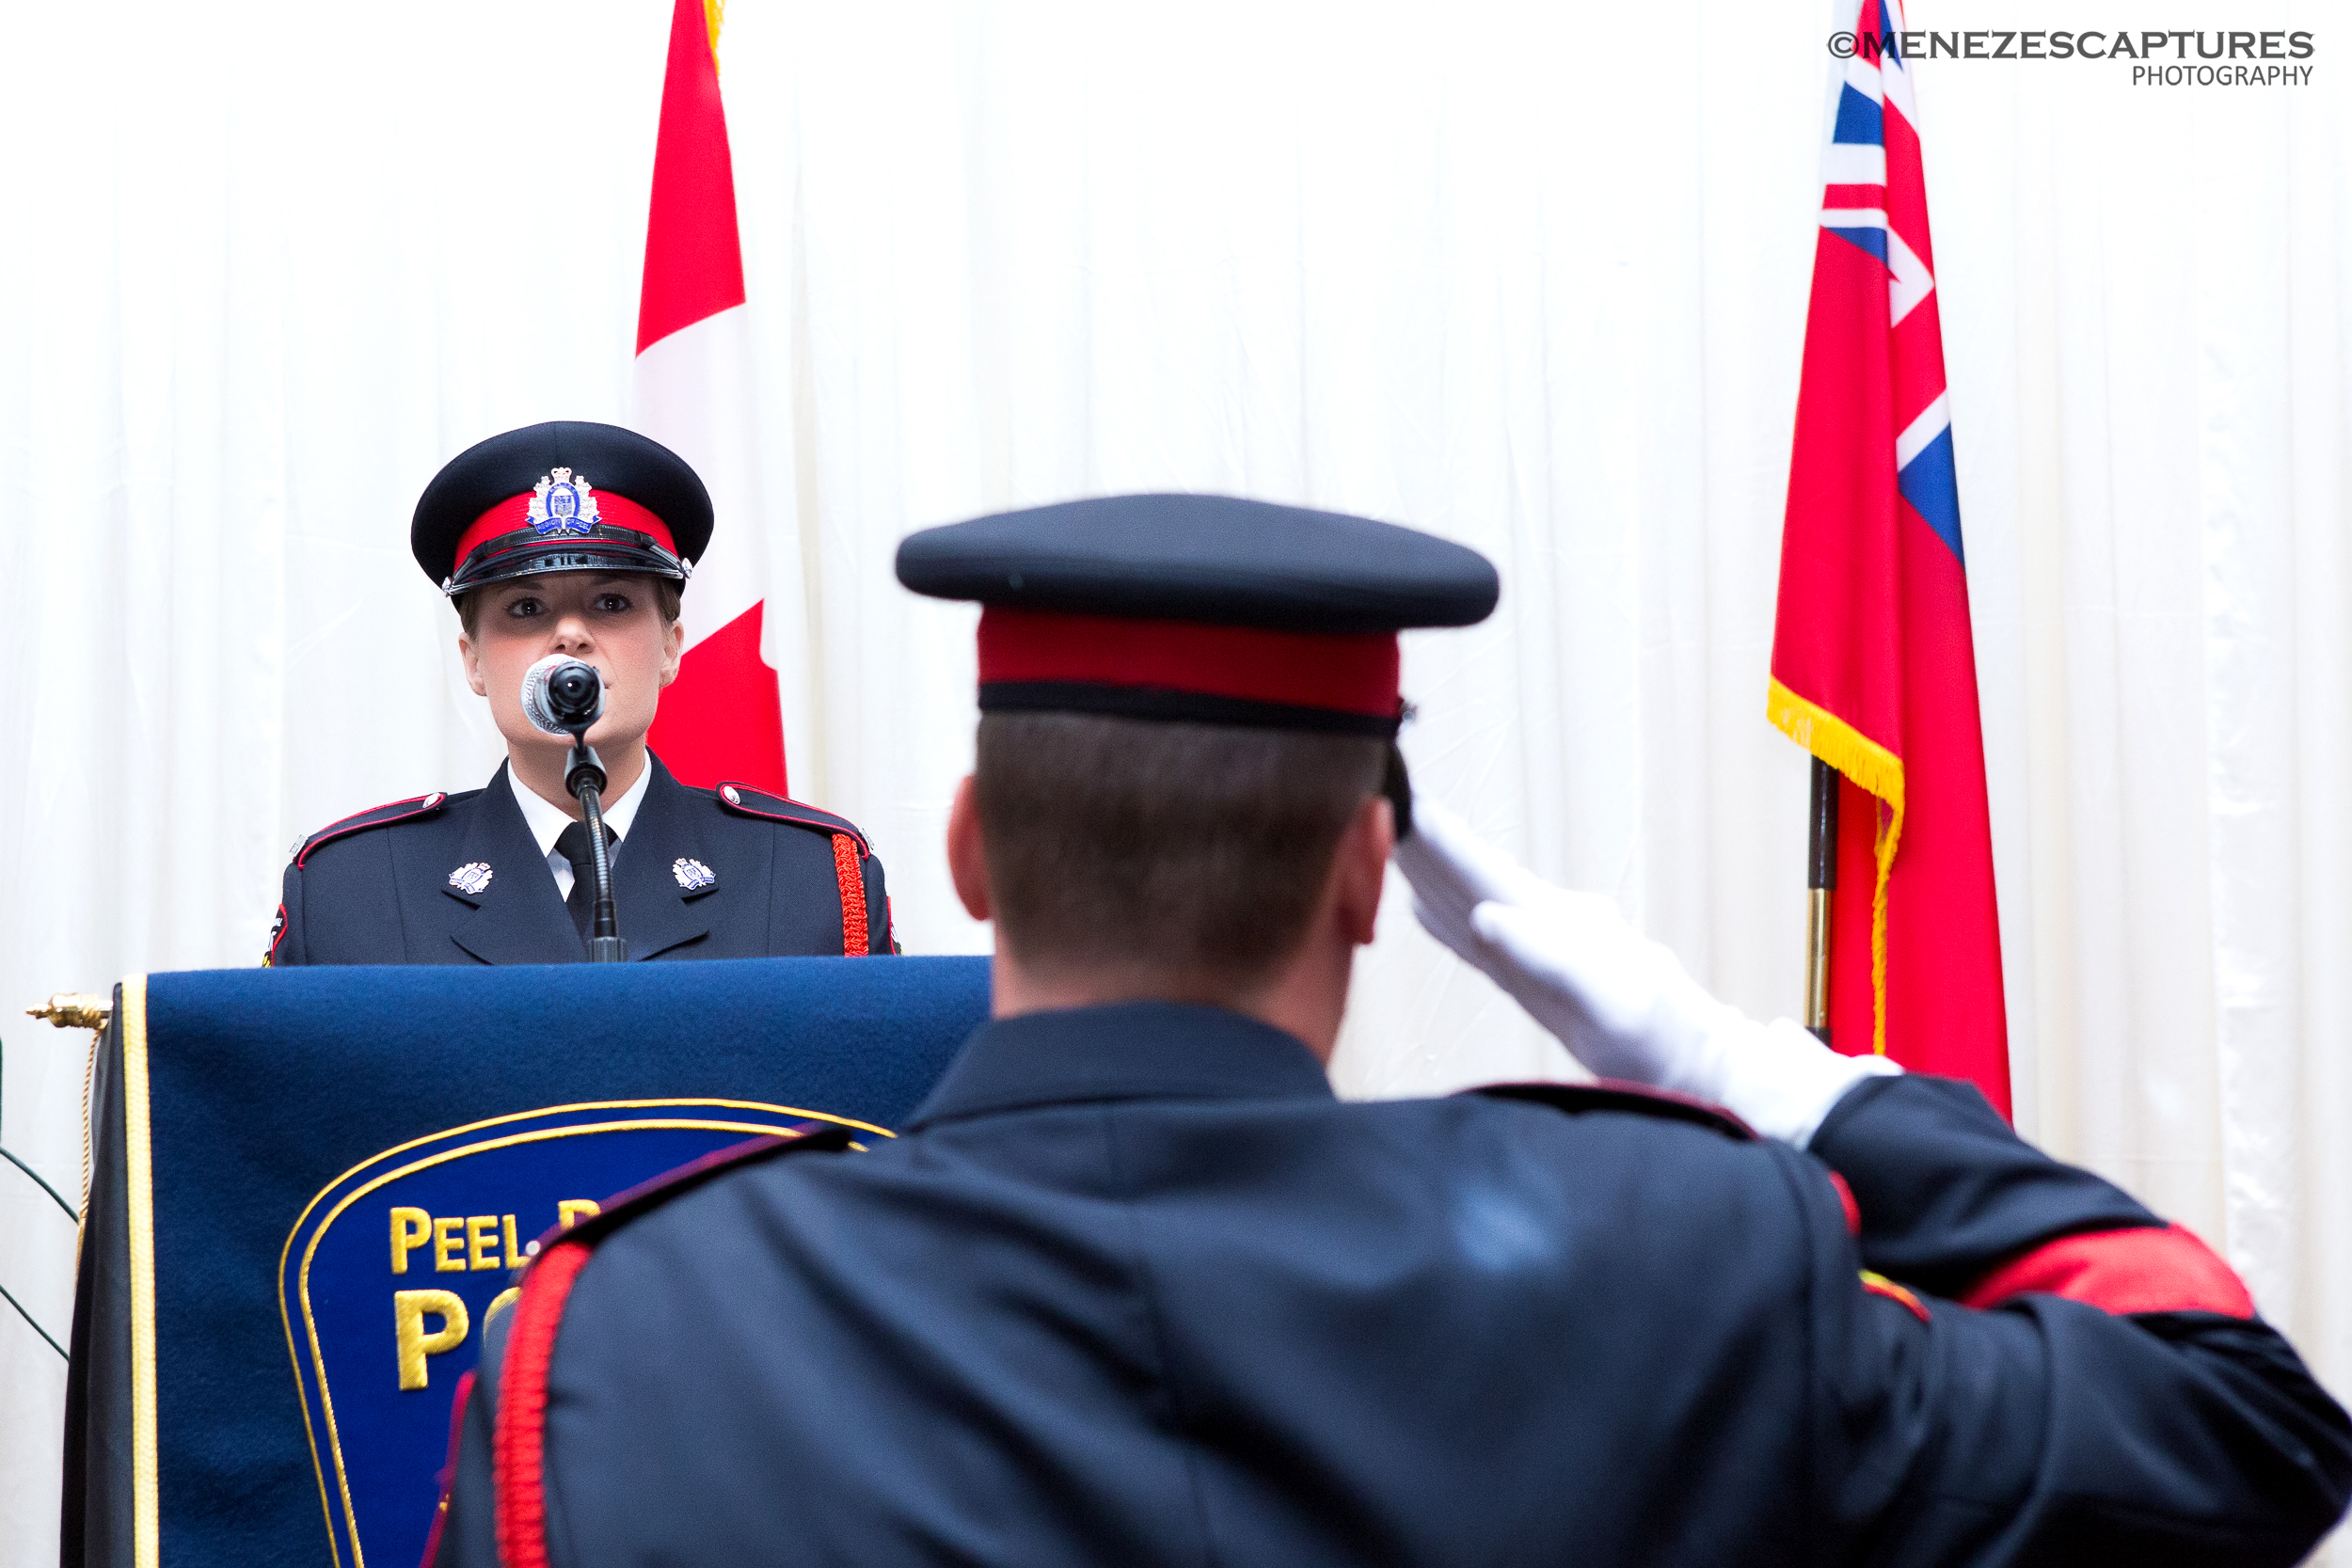 Peel Police Fundraiser (2016)